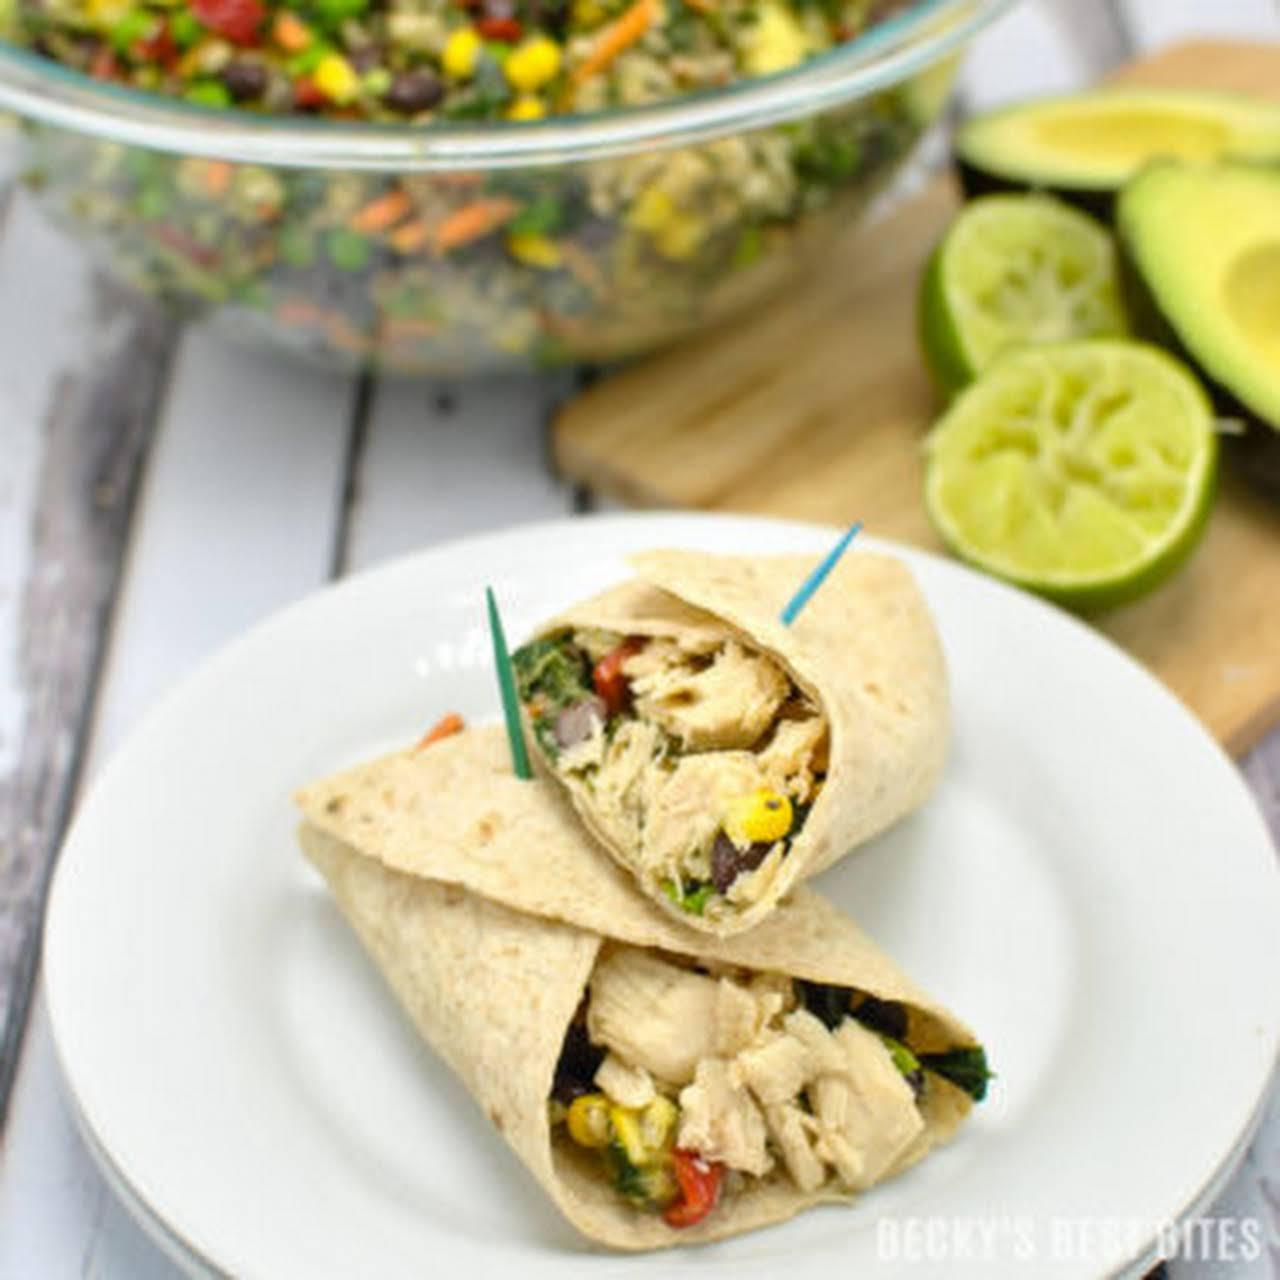 more or less The Go Loaded Tuna Quinoa Wraps